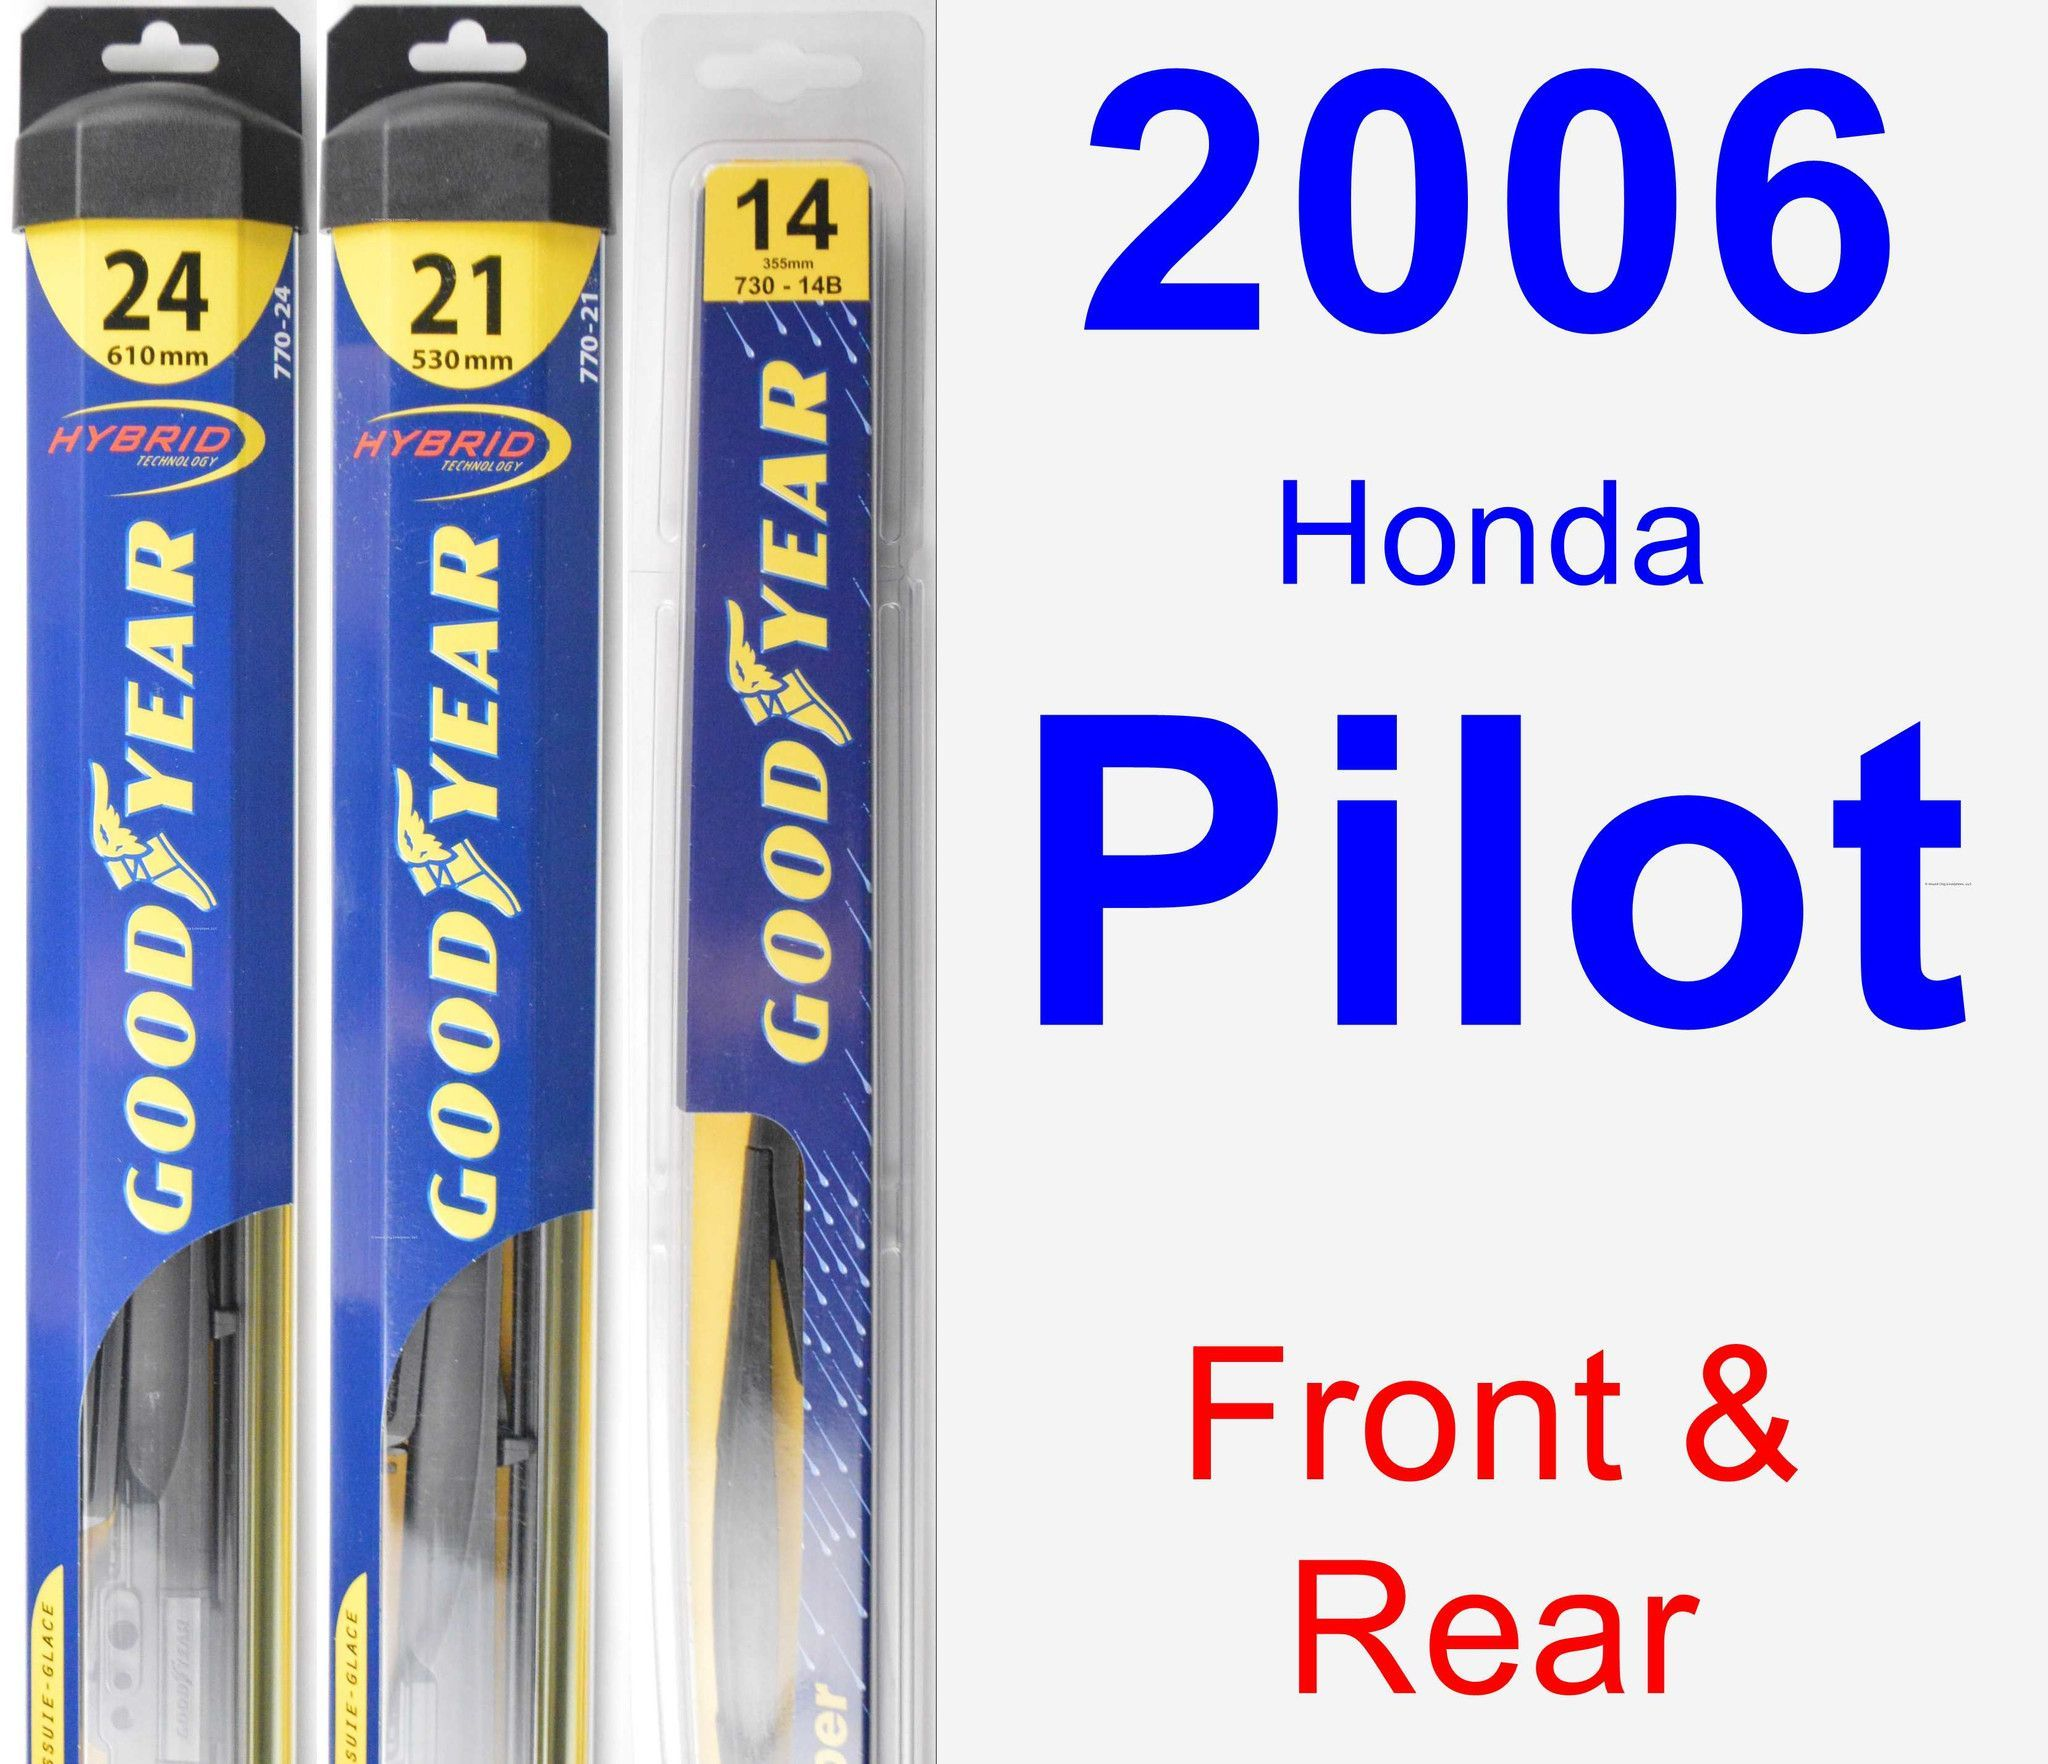 Front & Rear Wiper Blade Pack For 2006 Honda Pilot